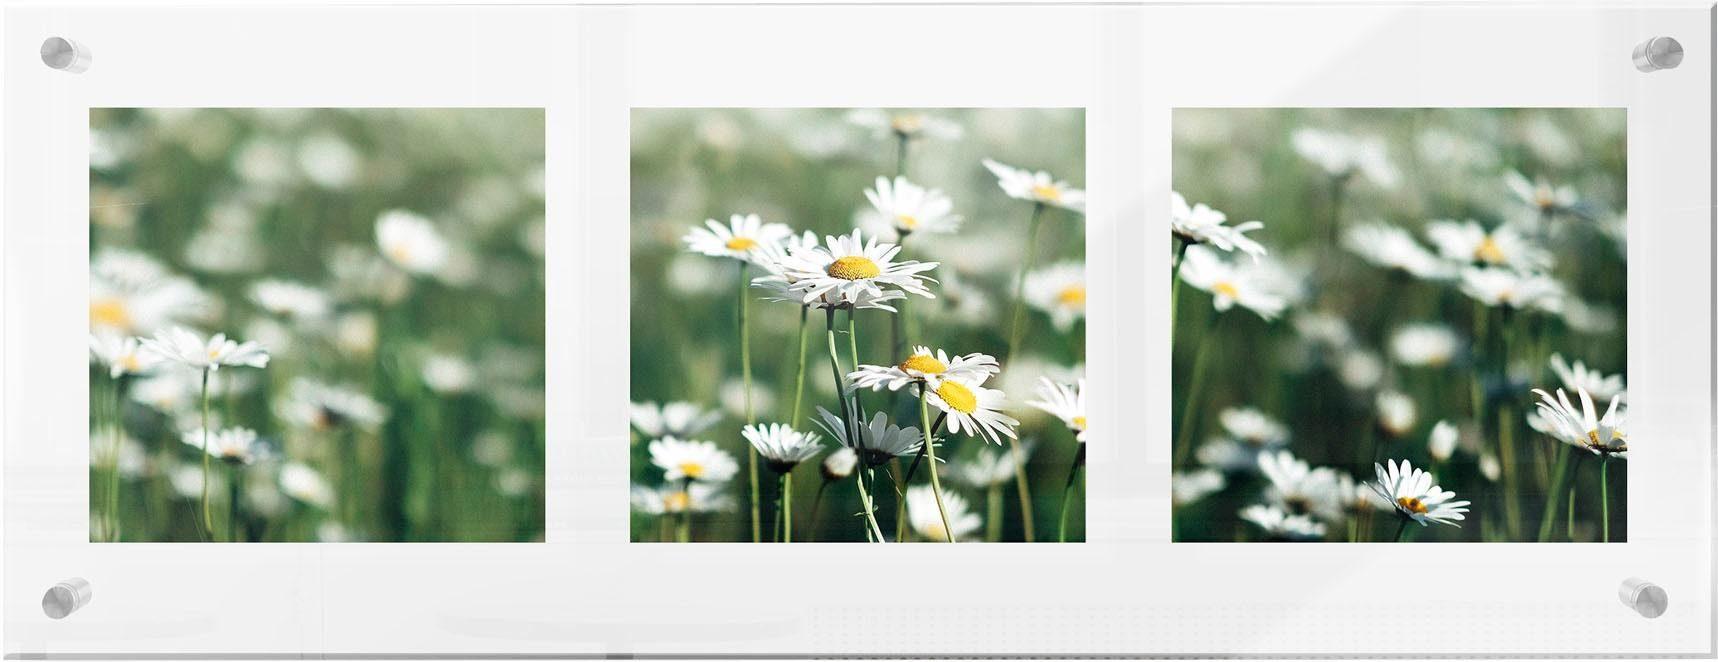 Premium collection by Home affaire Acrylglasbild »Daisy«, 78/28 cm